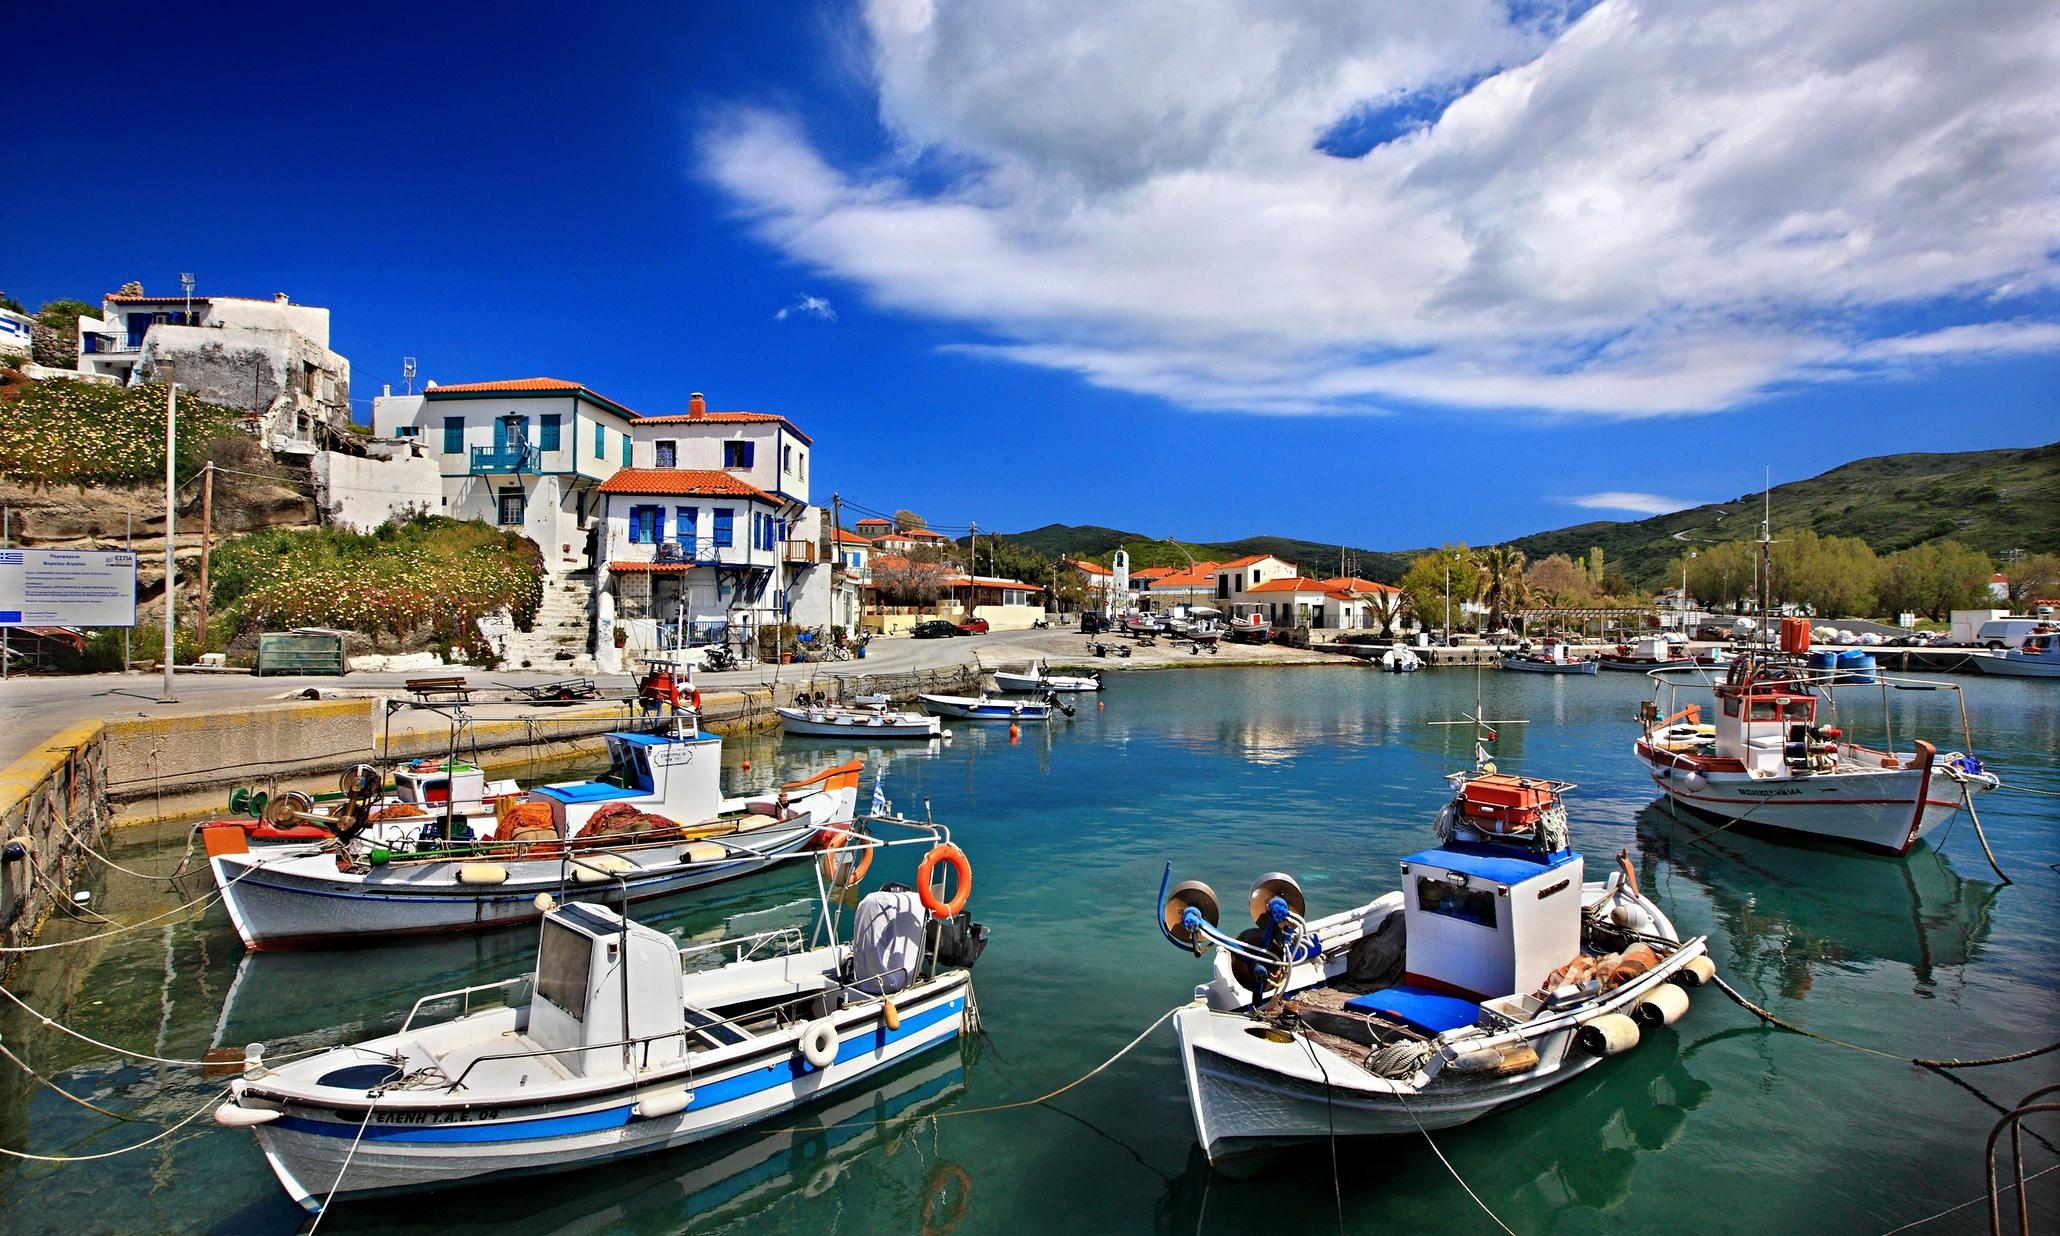 Noleggio Barche Isola di Agios Eustratios - Navalia | Noleggia un Sogno